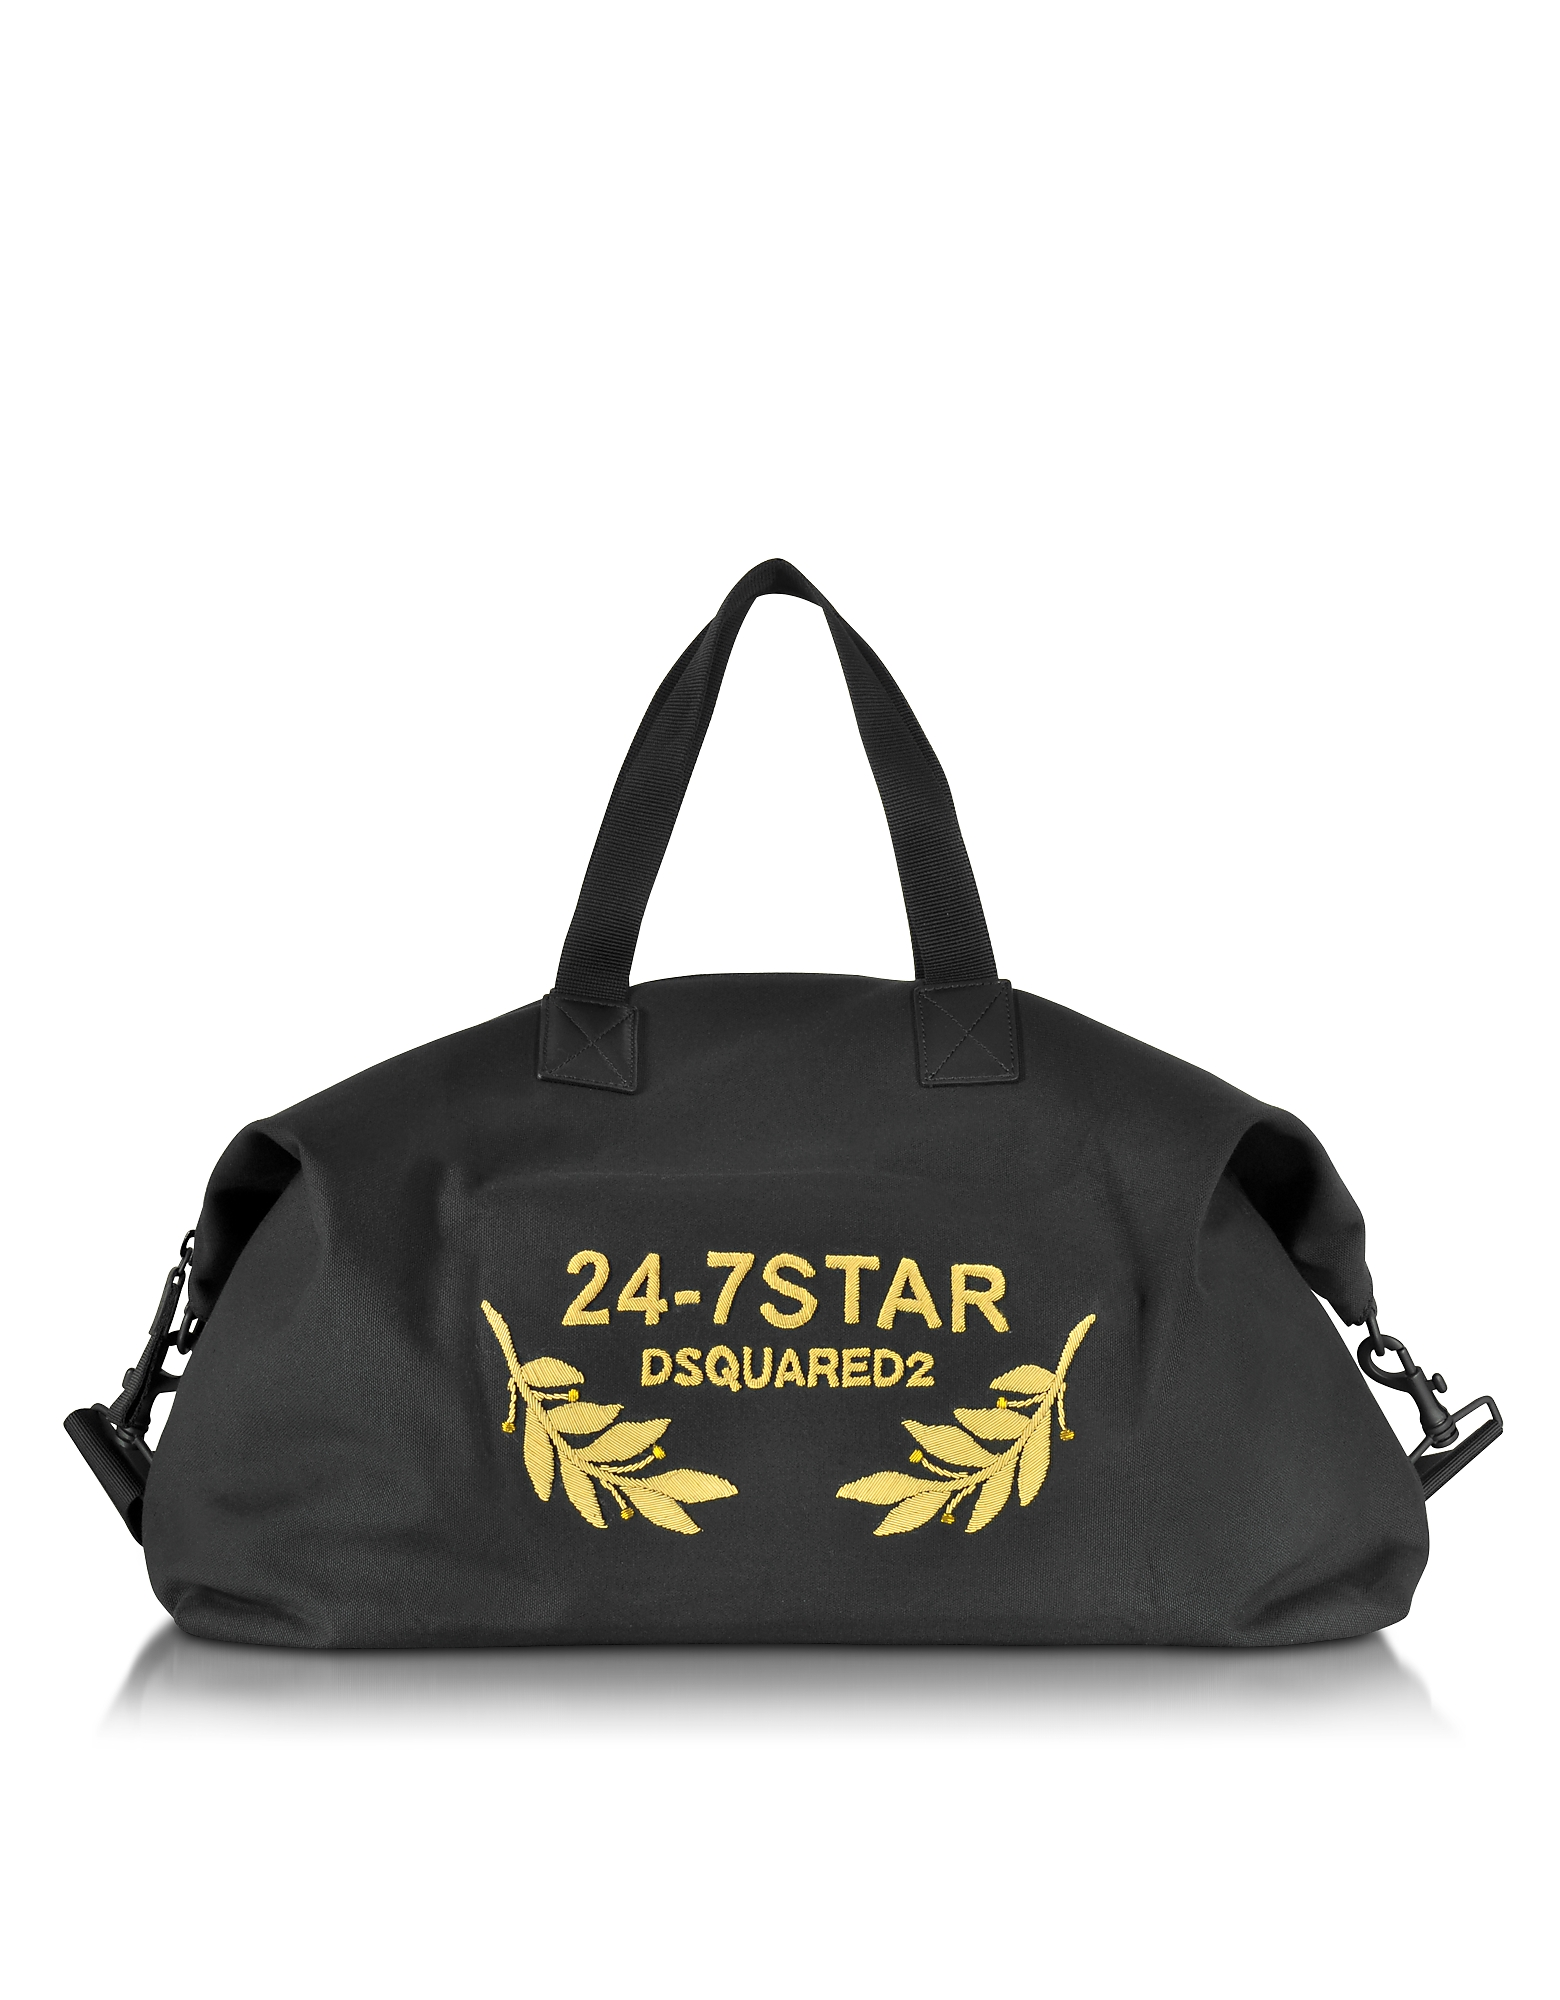 DSquared 24-7 Star Icon - Черная Сумка для Одежды из Ткани